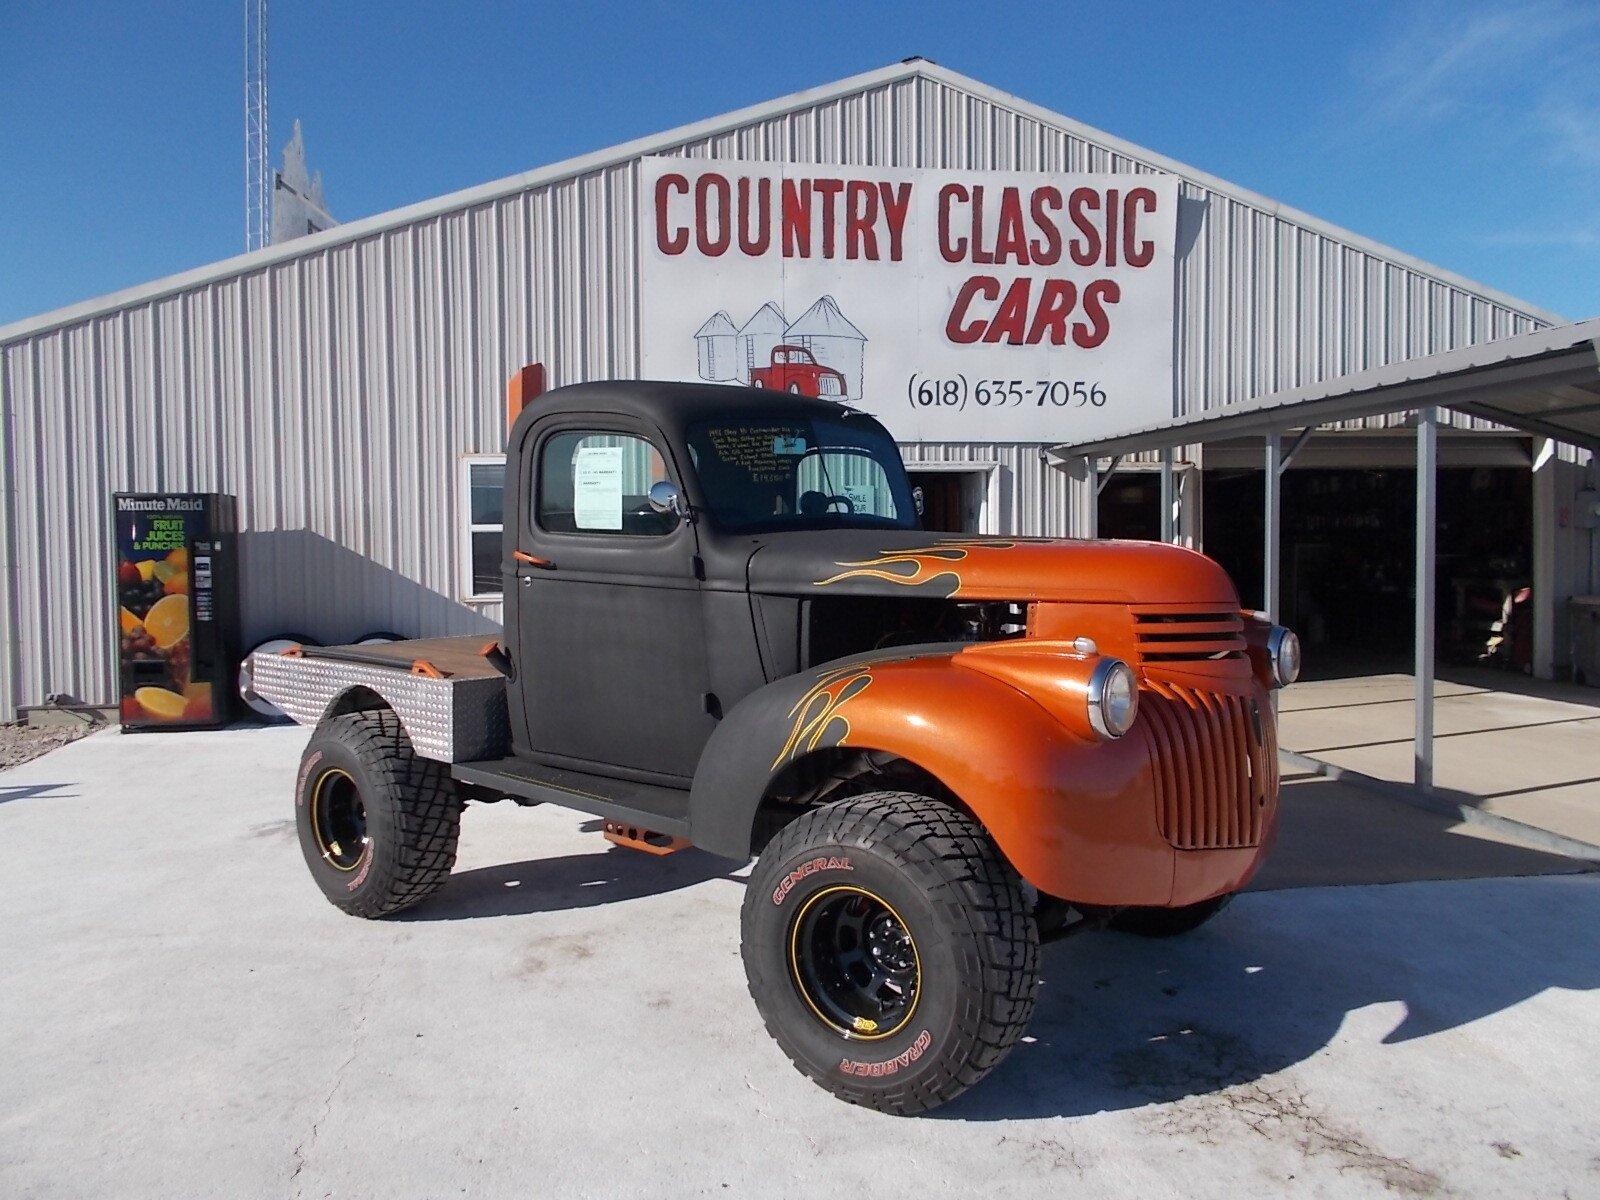 Craigslist St Cloud Mn Cars >> 1948 Chevy For Sale Craigslist | Autos Post